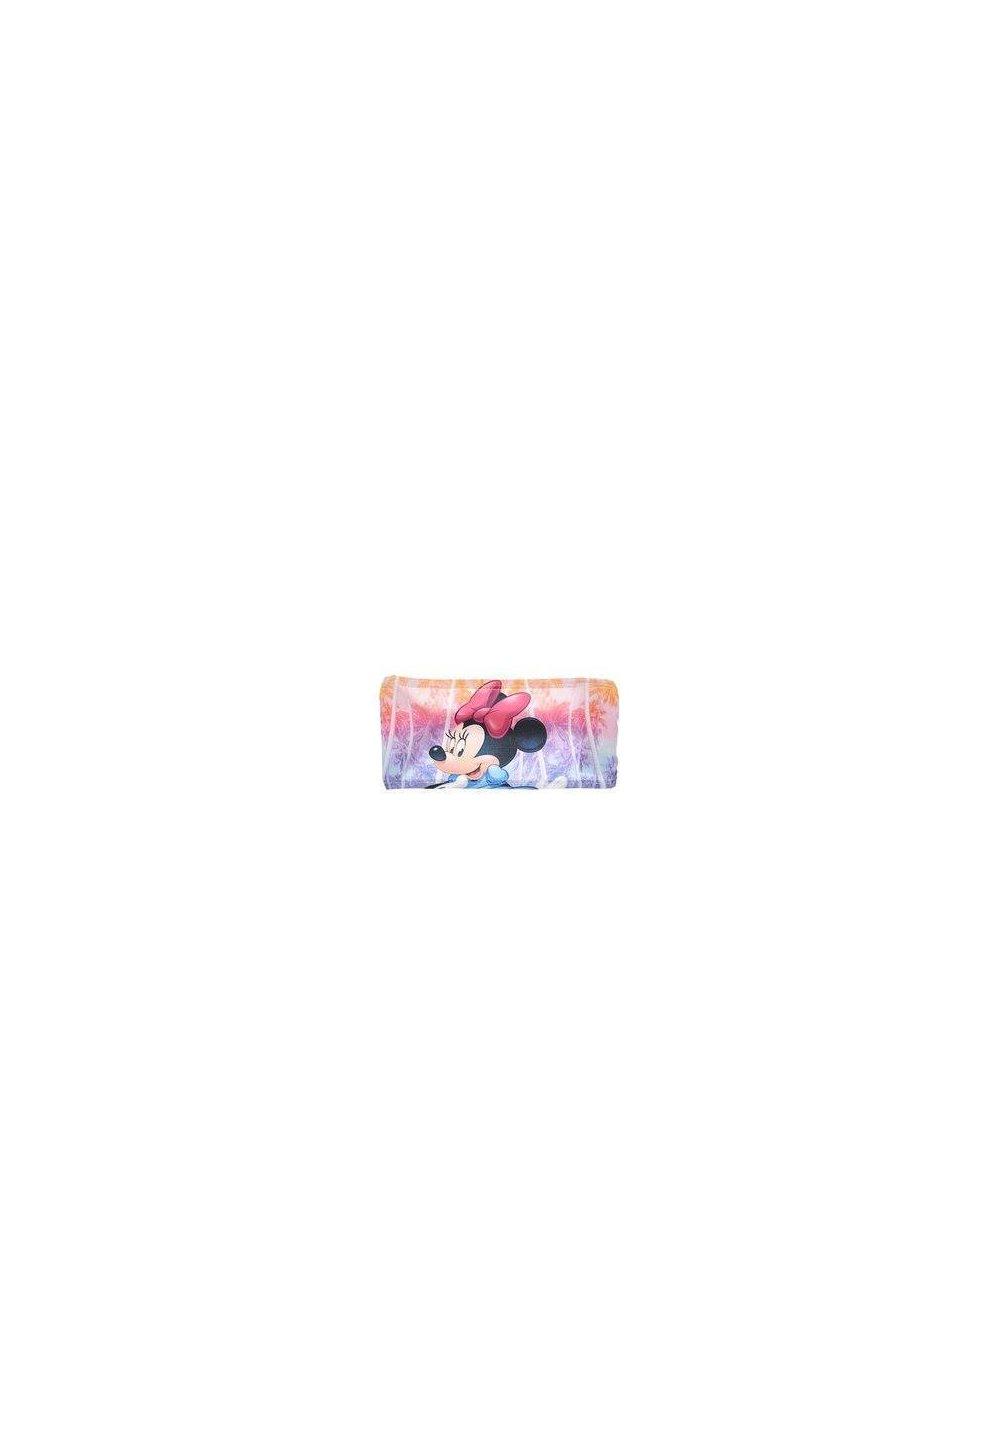 Bentita poliester, Hawai roz, Minnie imagine